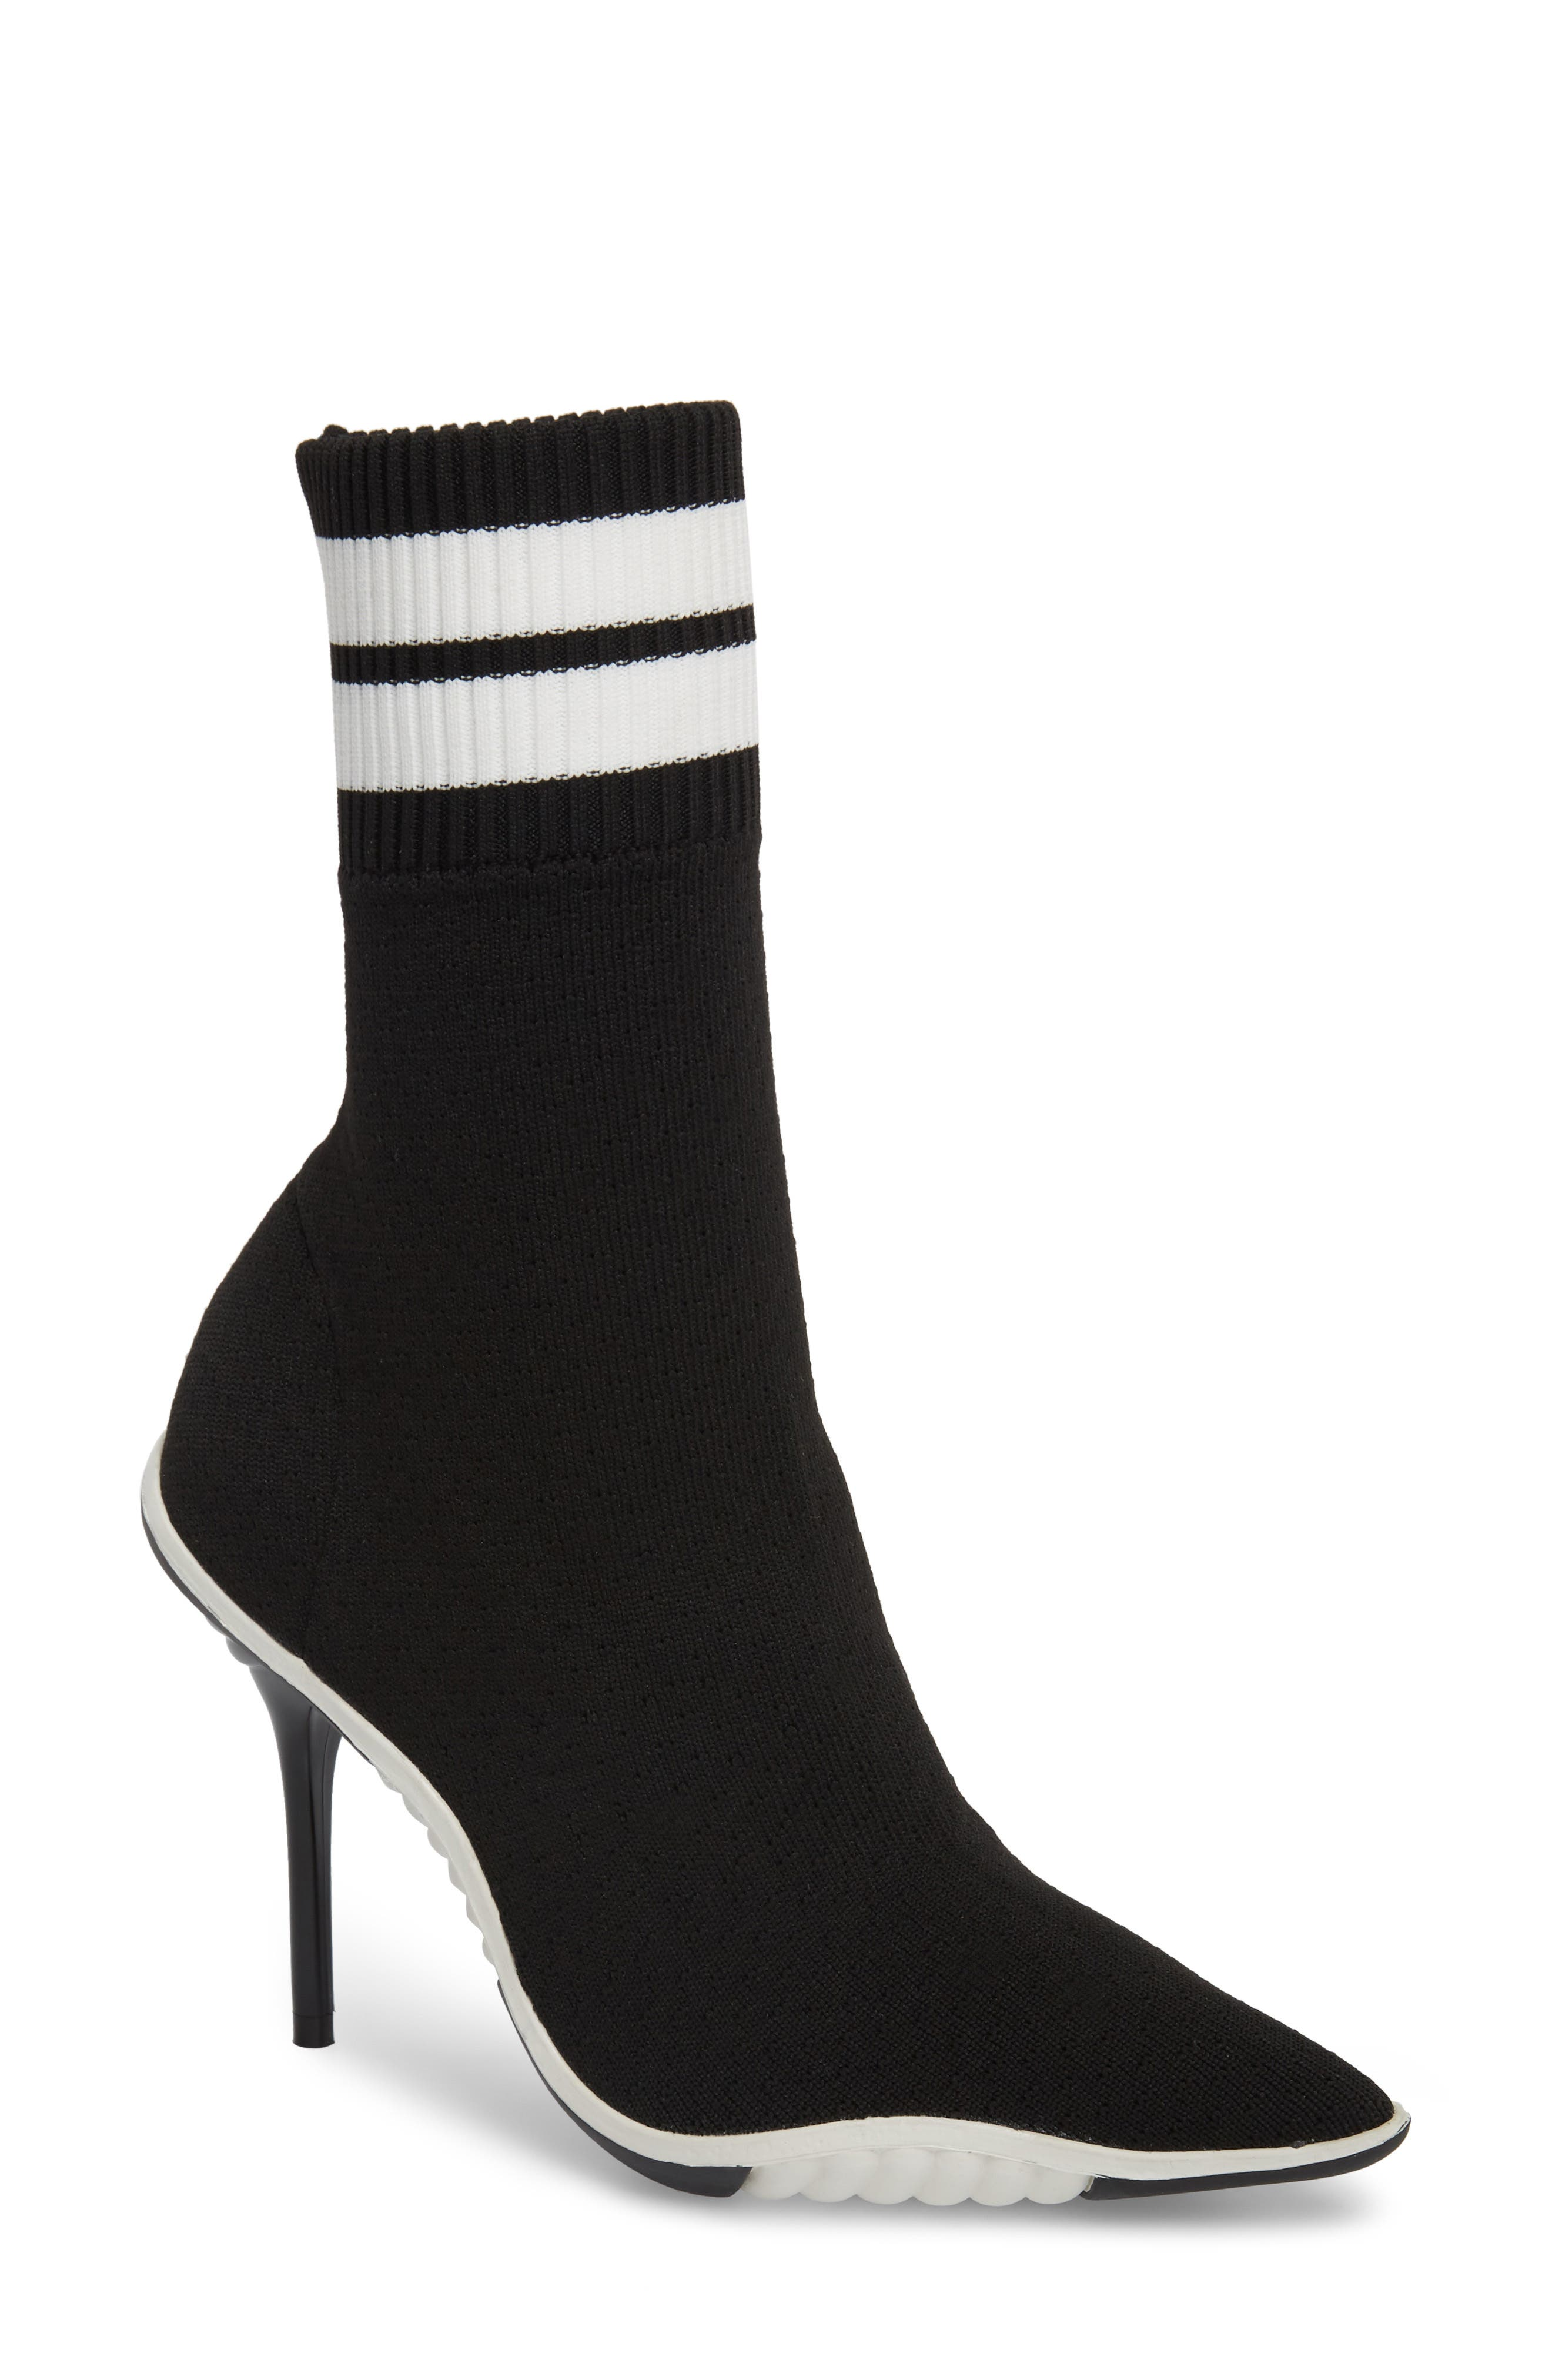 Goal Sock Sneaker Bootie,                         Main,                         color, Black/ White Fabric